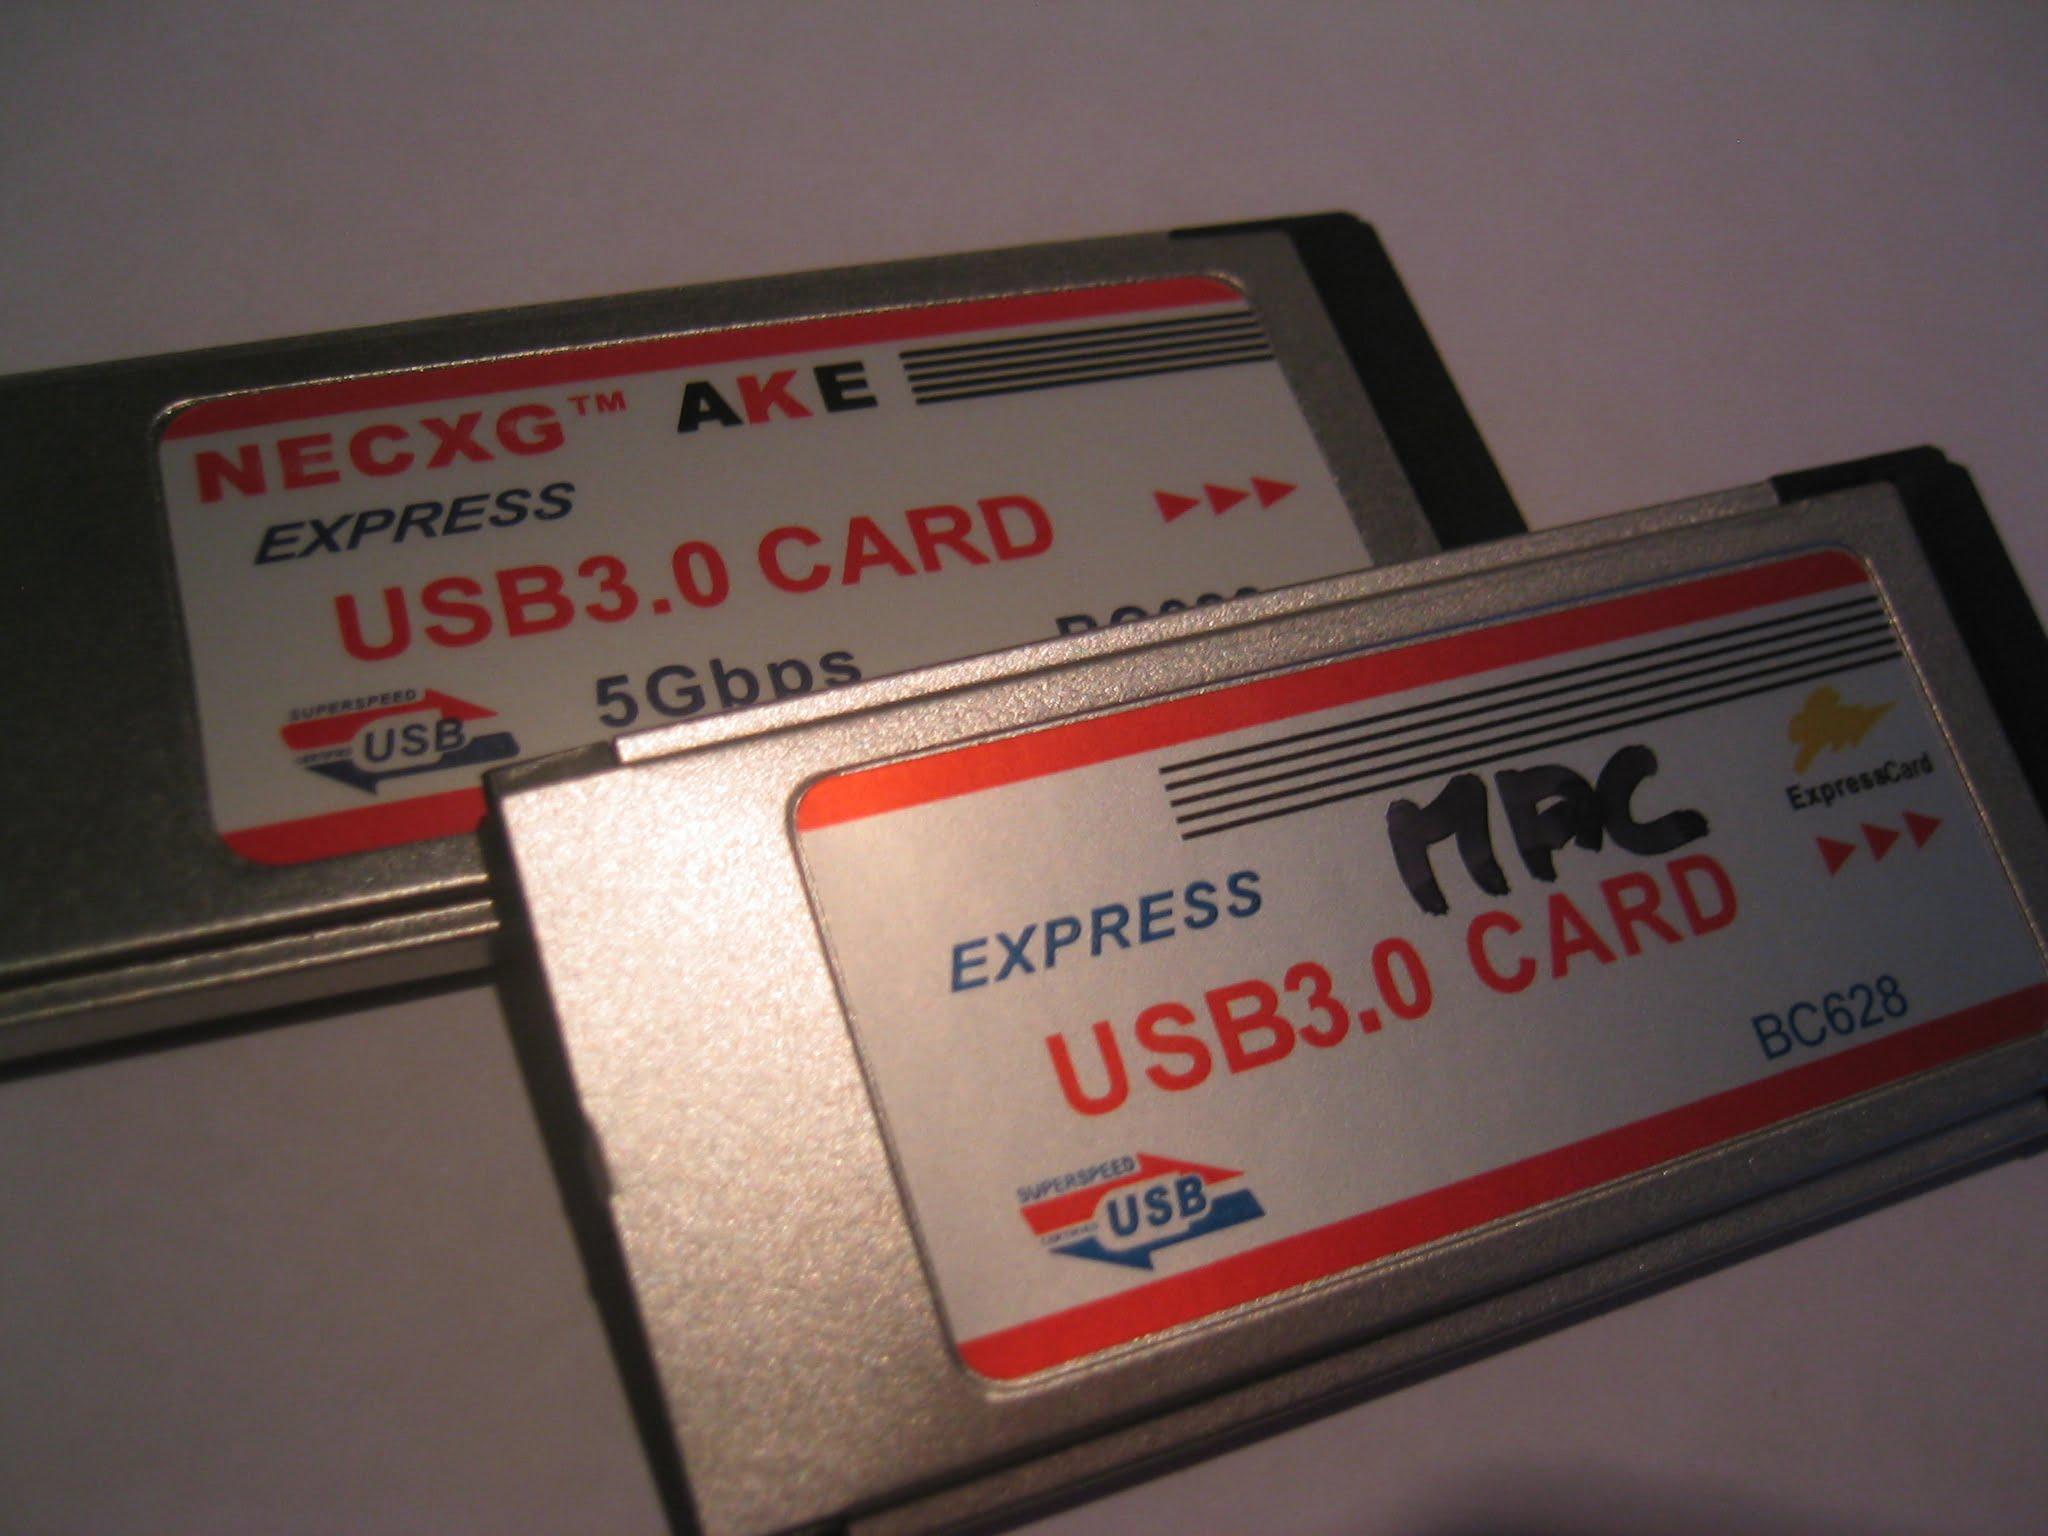 Express Card 34 USB 3.0 in MacBook Pro